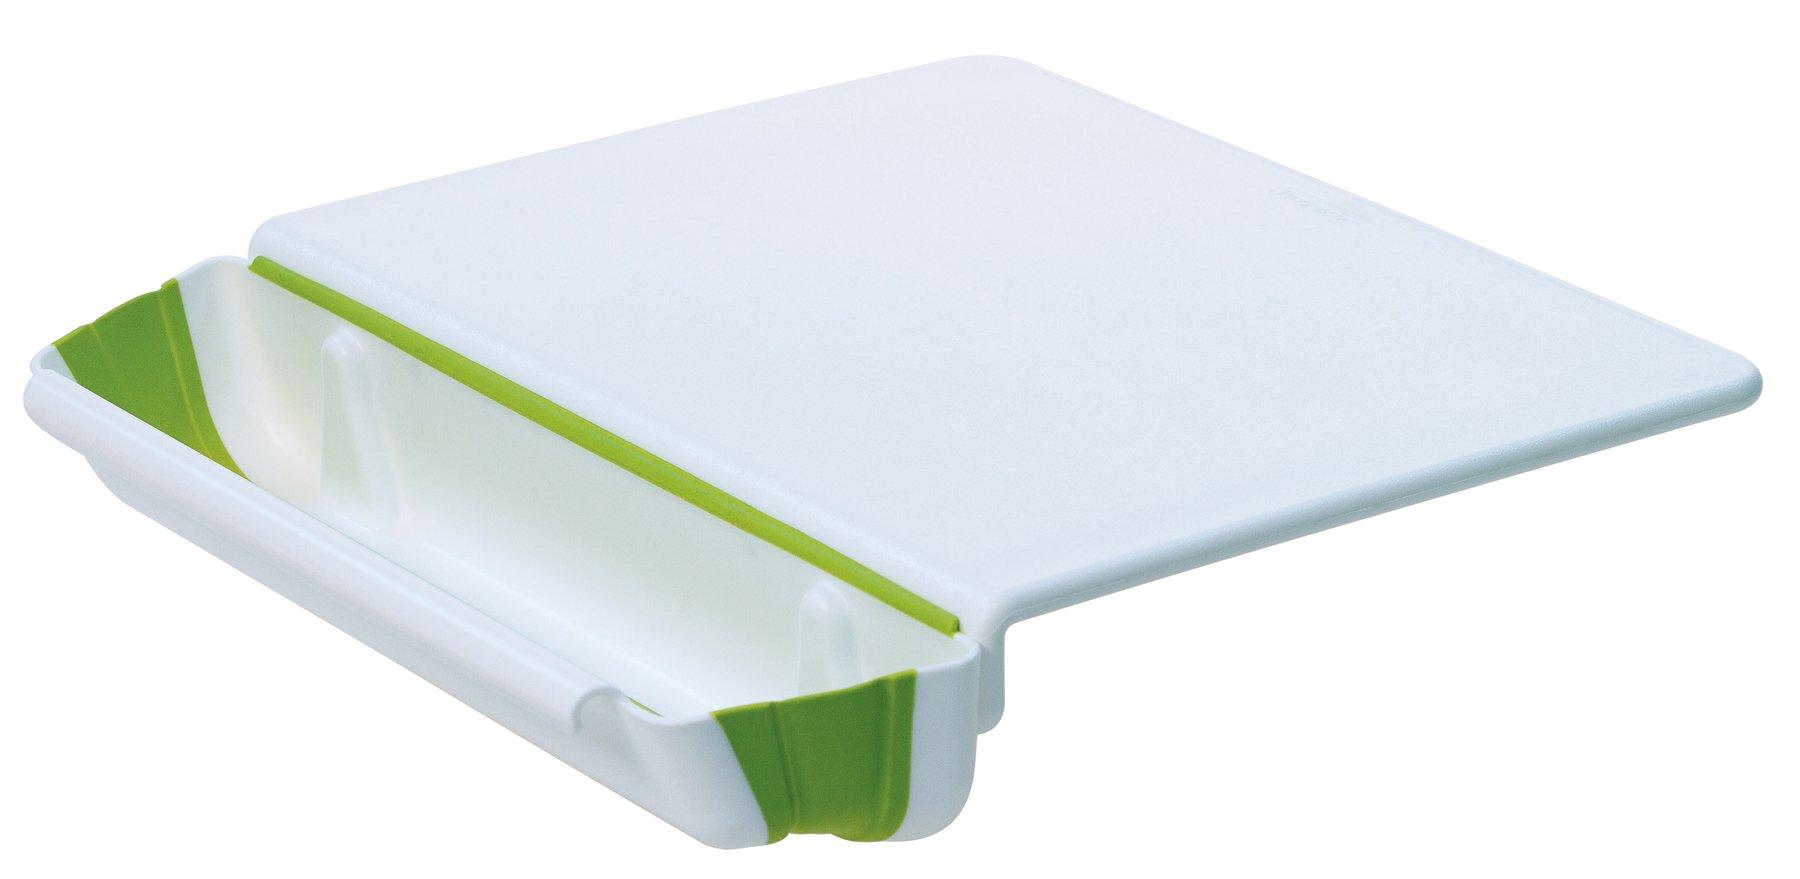 Progressive International, PCB-3600 11x15 Counter Edge Cutting Board with Collapsible Scrap Bin